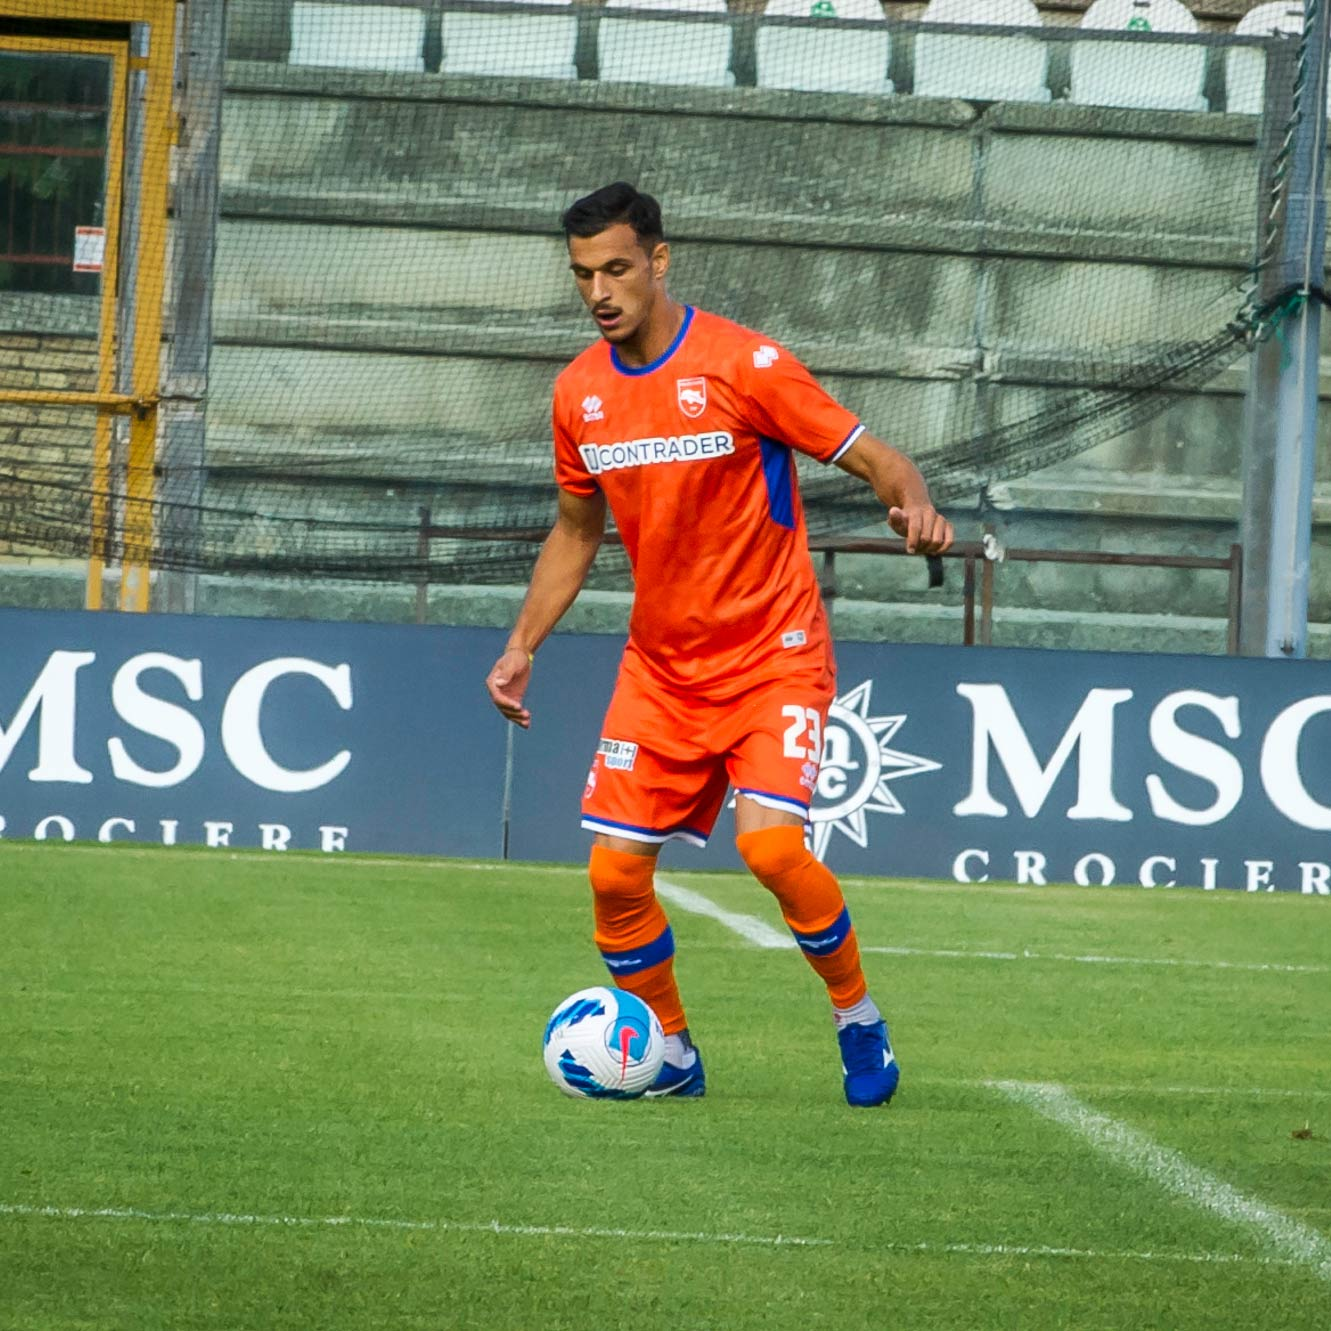 Kit away Pescara arancione